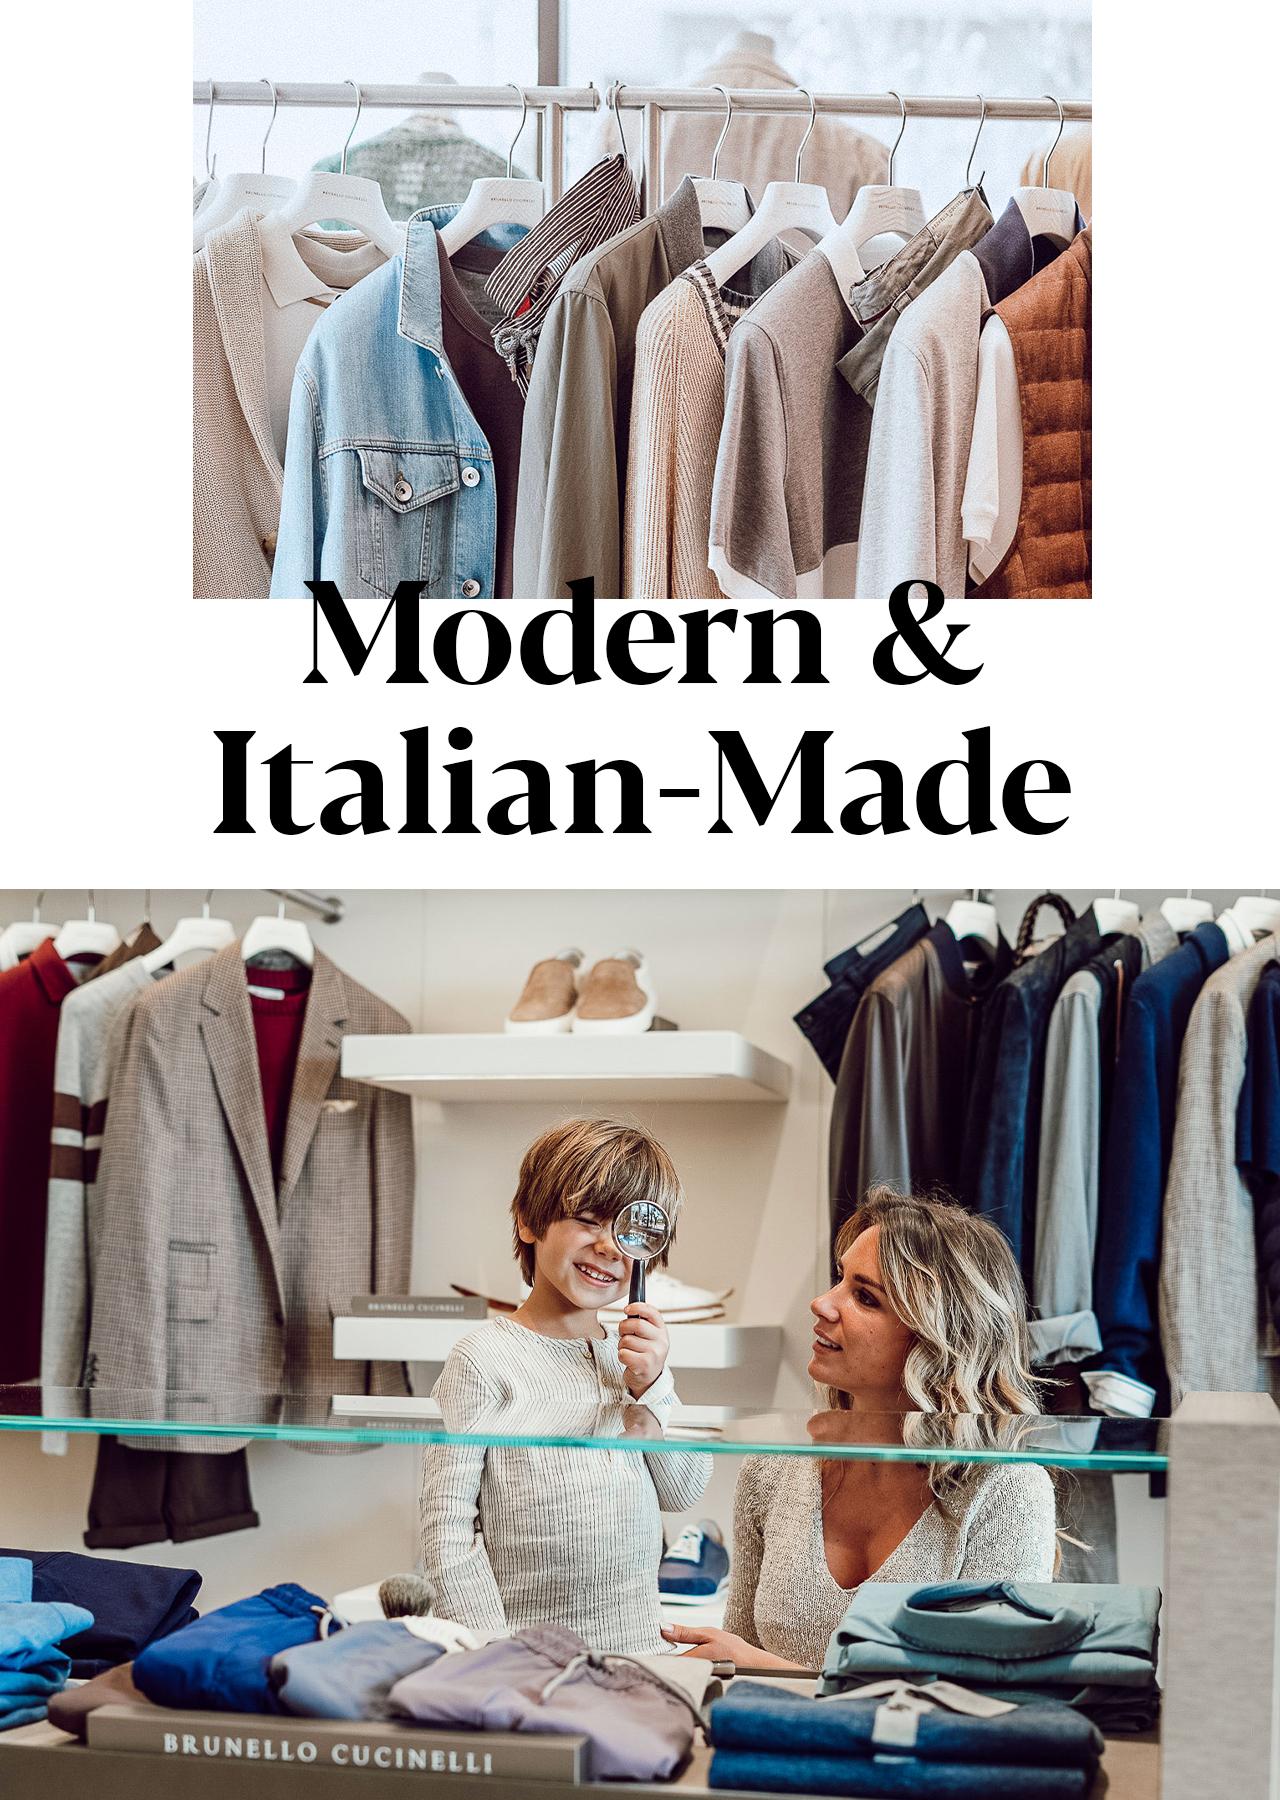 Modern & Italian-Made